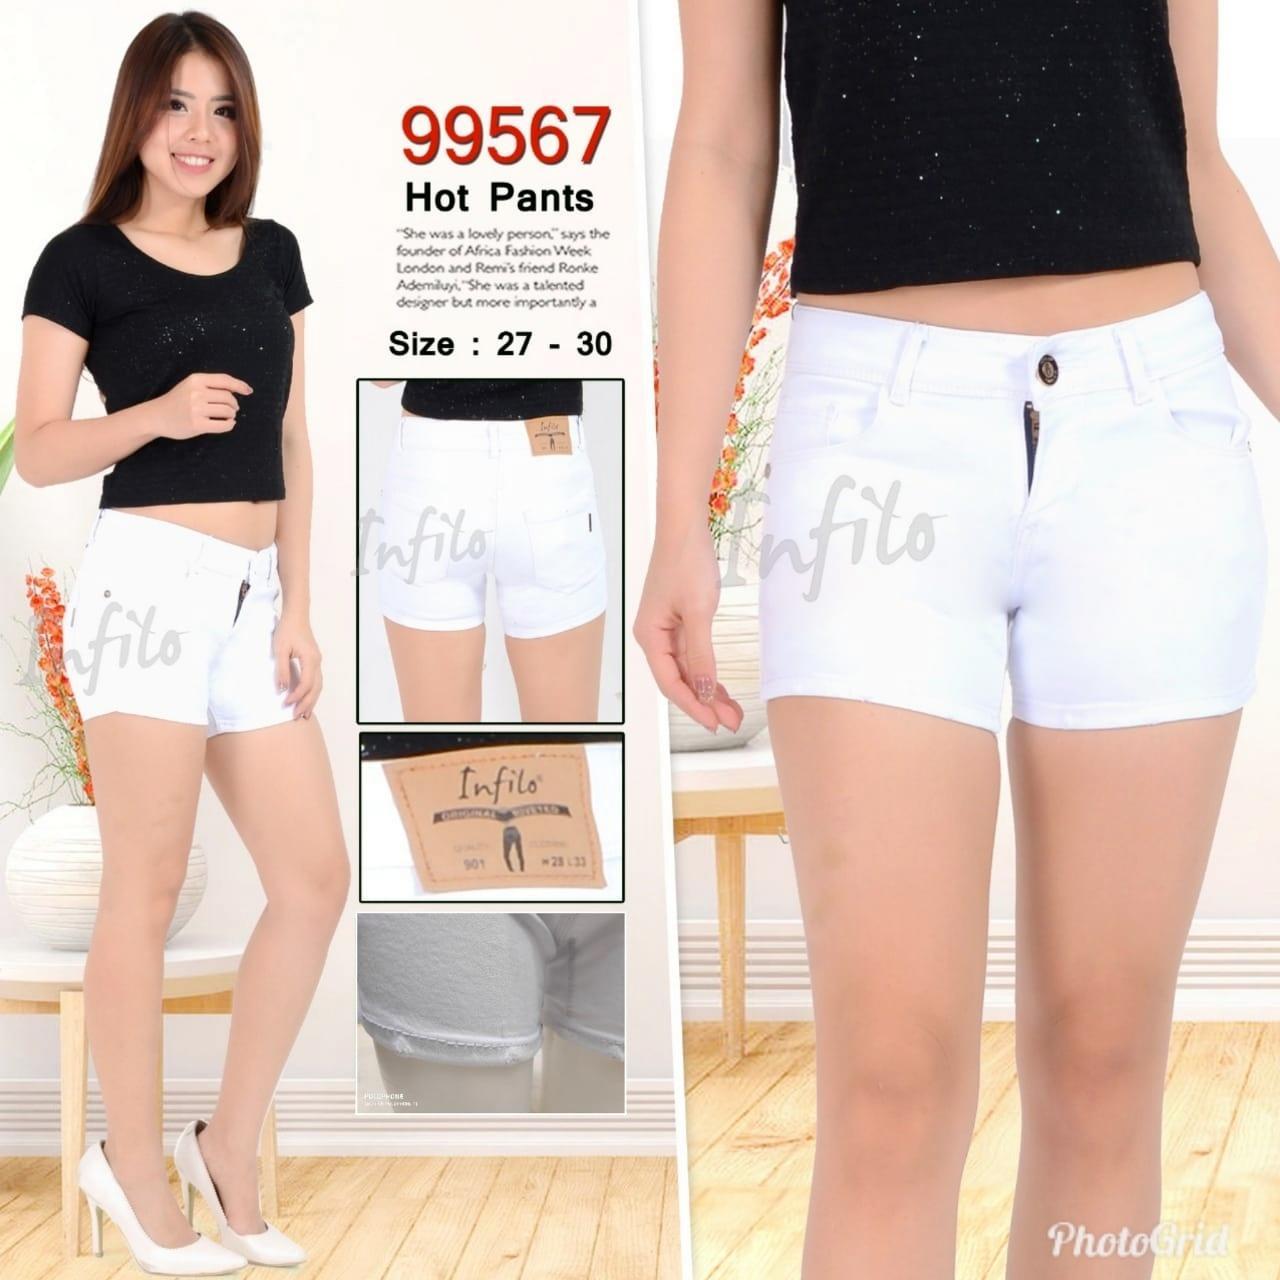 Celana Pendek Hotpants Stretch Soft Jeans Fashion Wanita Pakaian Wanita Celana Pendek Denim Wanita